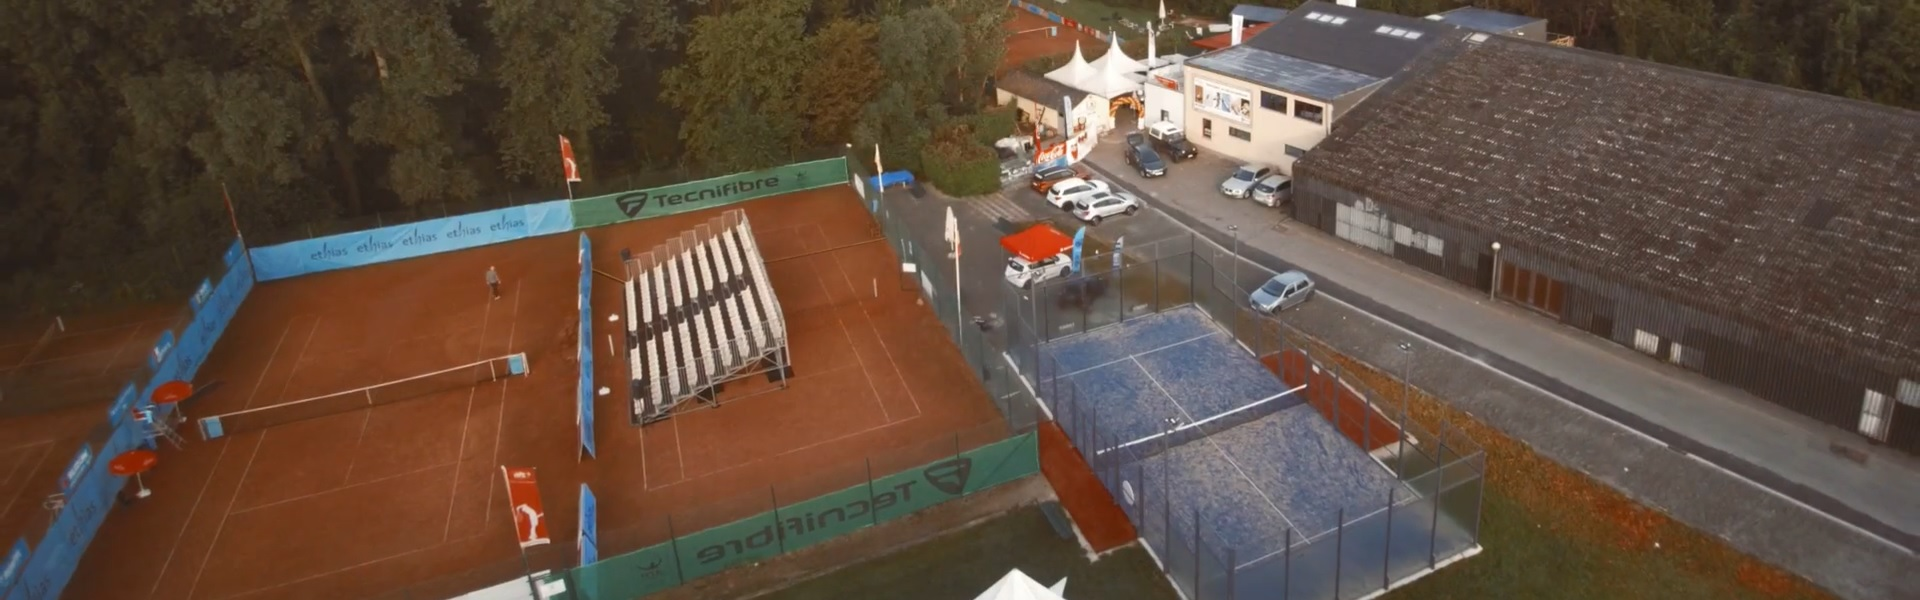 <br>Bienvenue au Tennisland